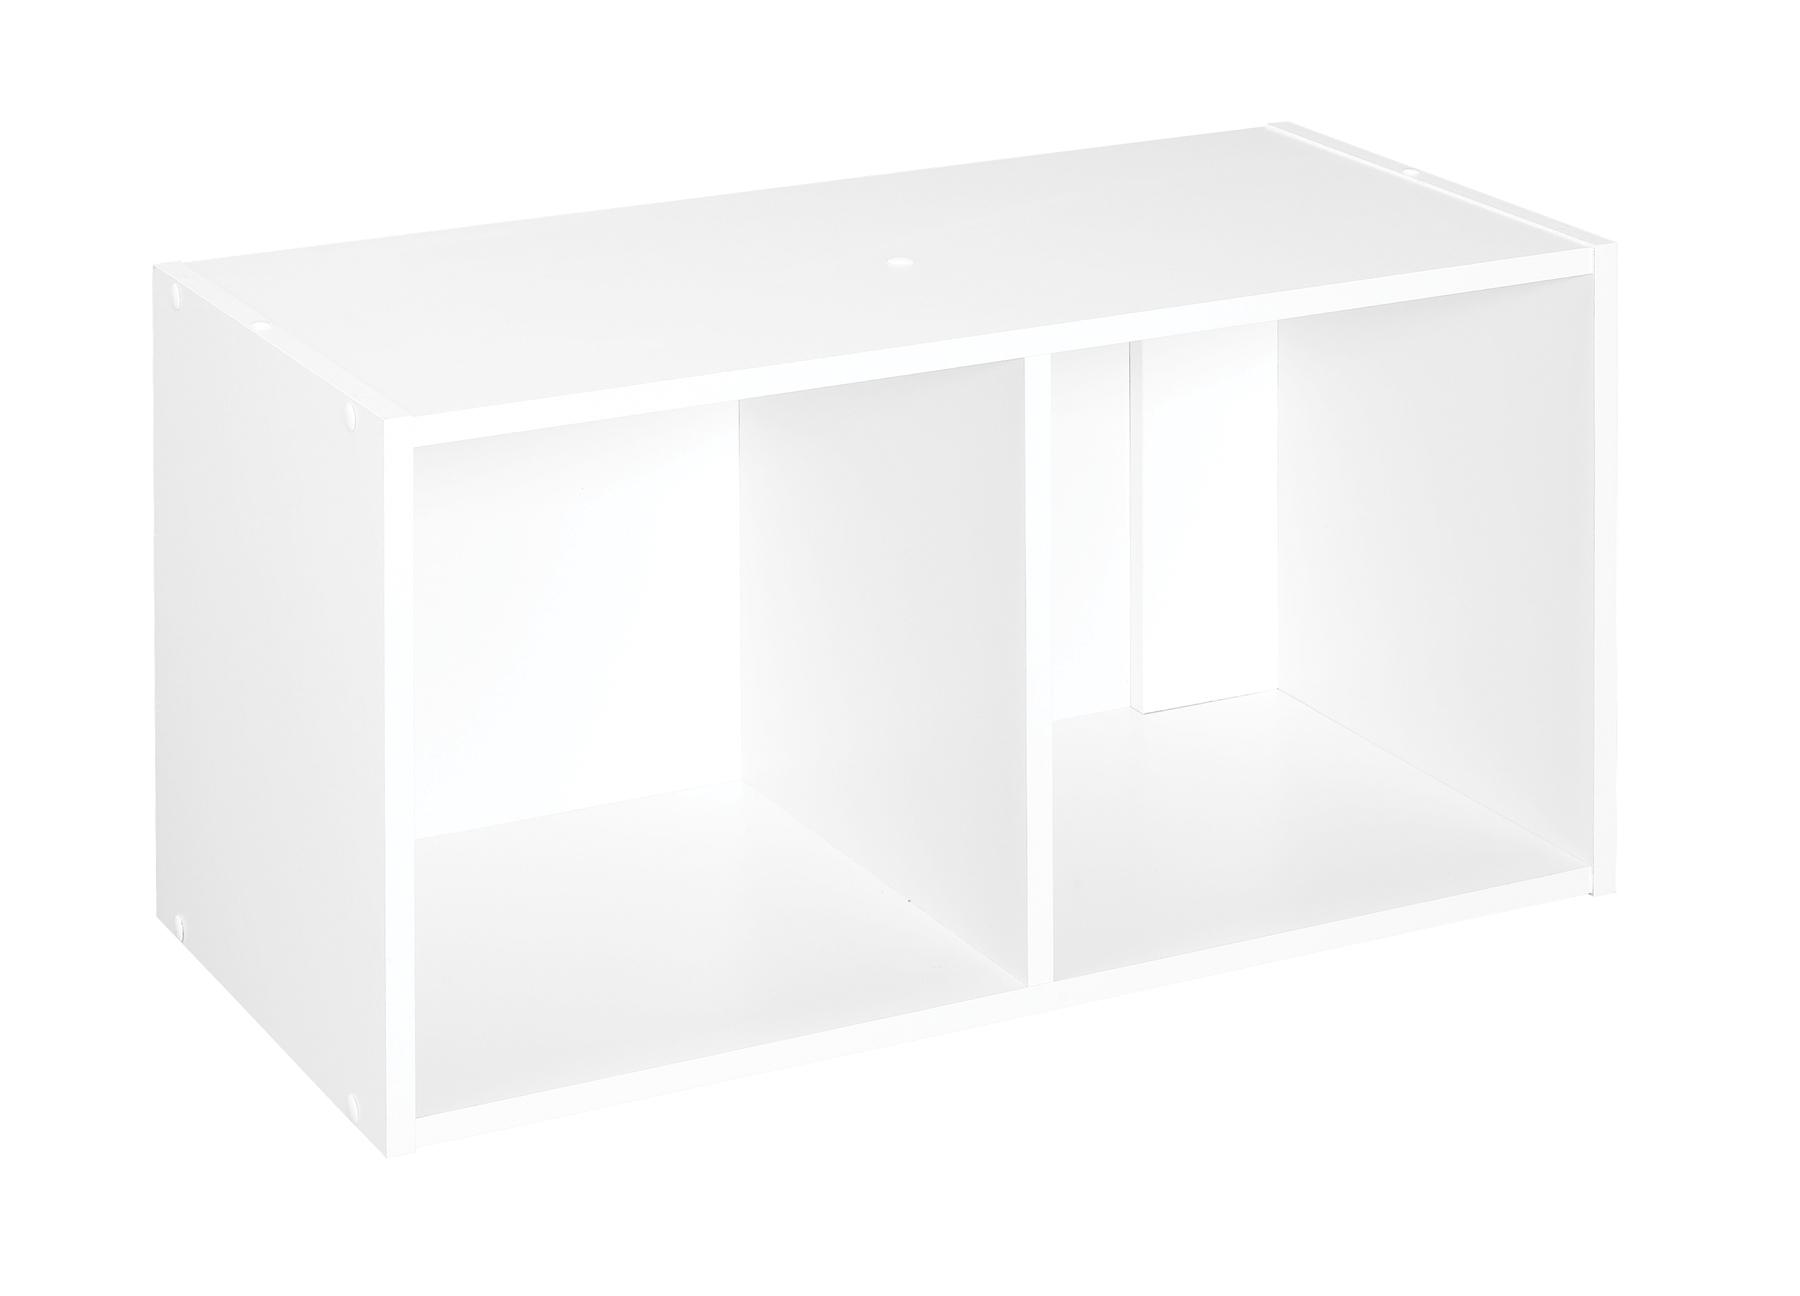 ClosetMaid Cubeicals Stack u0026 Hang 2 Cube Organizer  sc 1 st  eBay & ClosetMaid Cubeicals Stack u0026 Hang 2 Cube Organizer | eBay